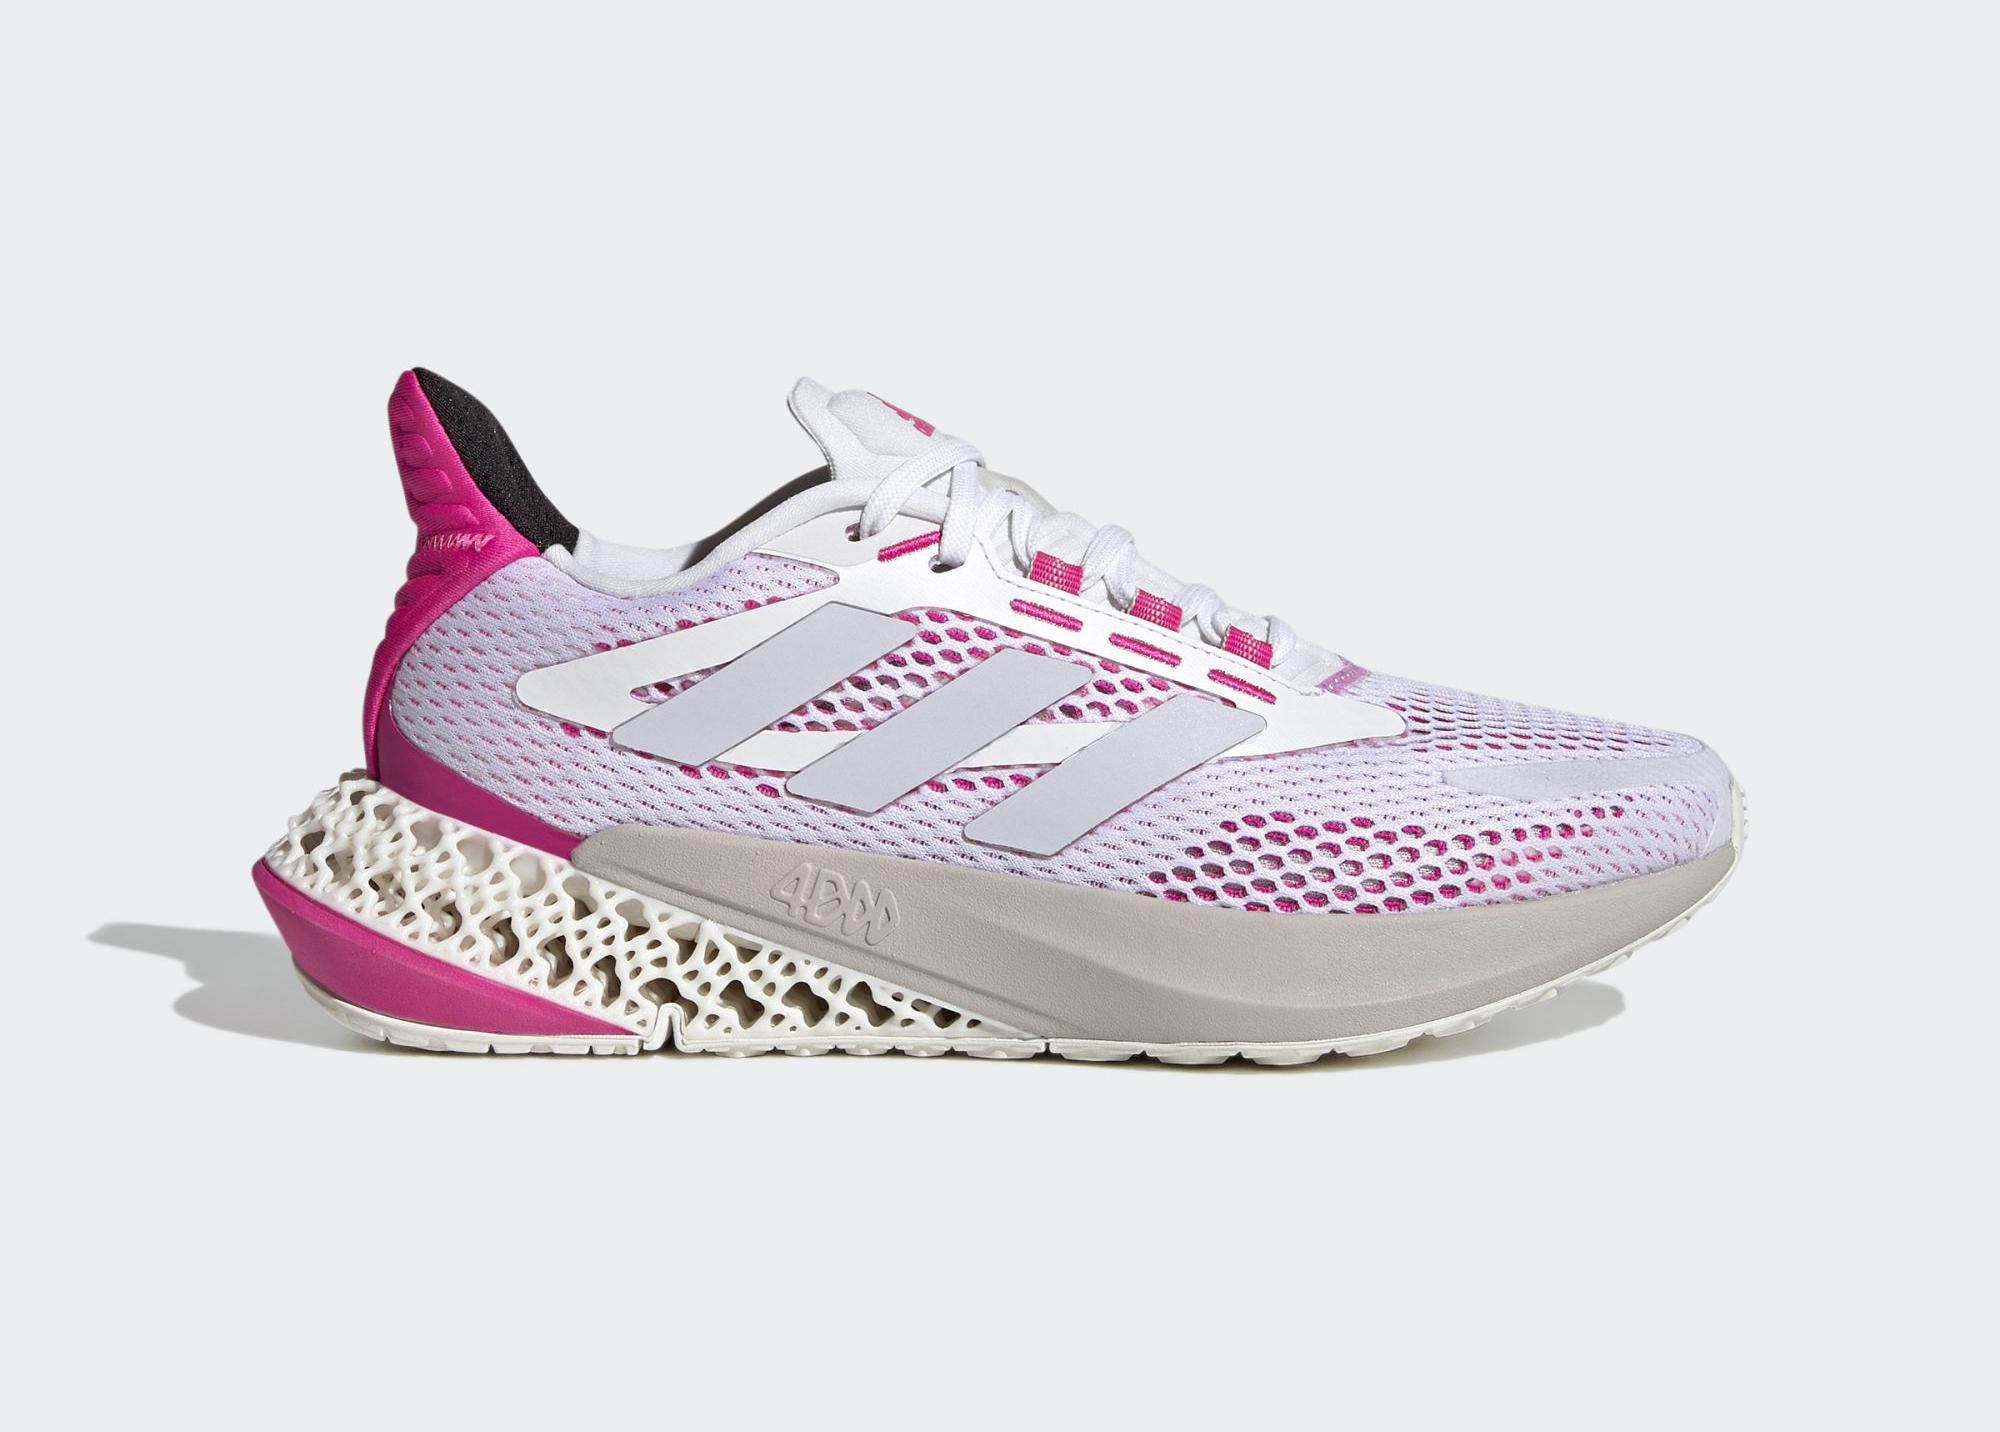 Adidas 4dfwd shoes